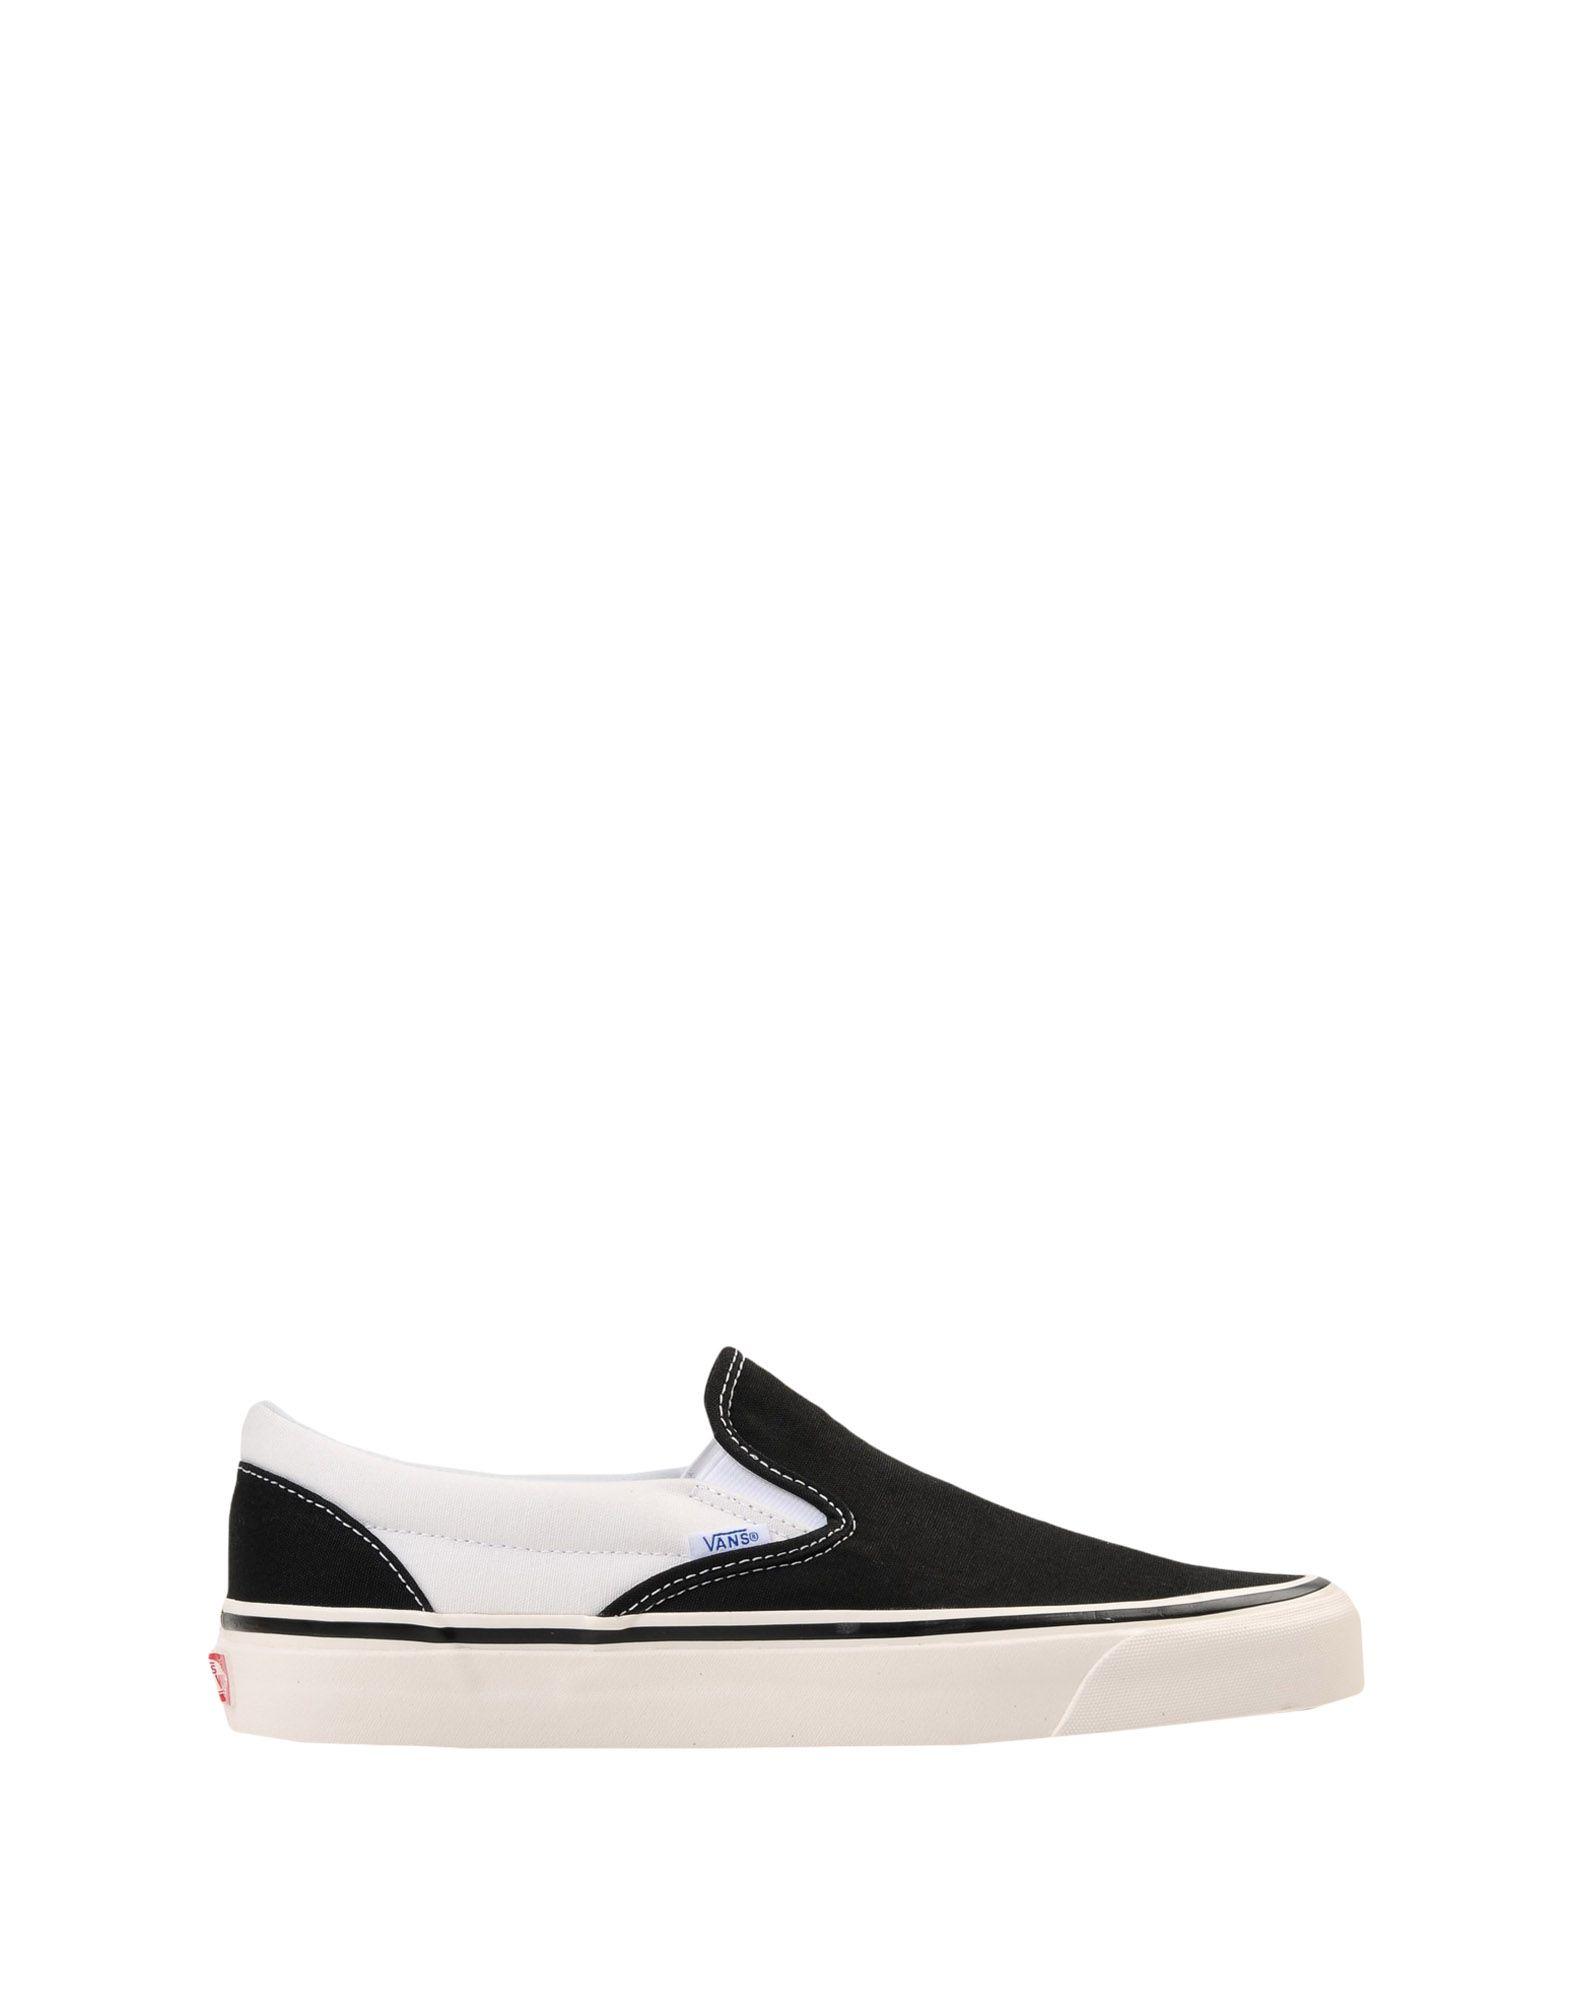 Sneakers Vans Ua Classic Slip-On 98 Dx - Uomo - 11469849NM